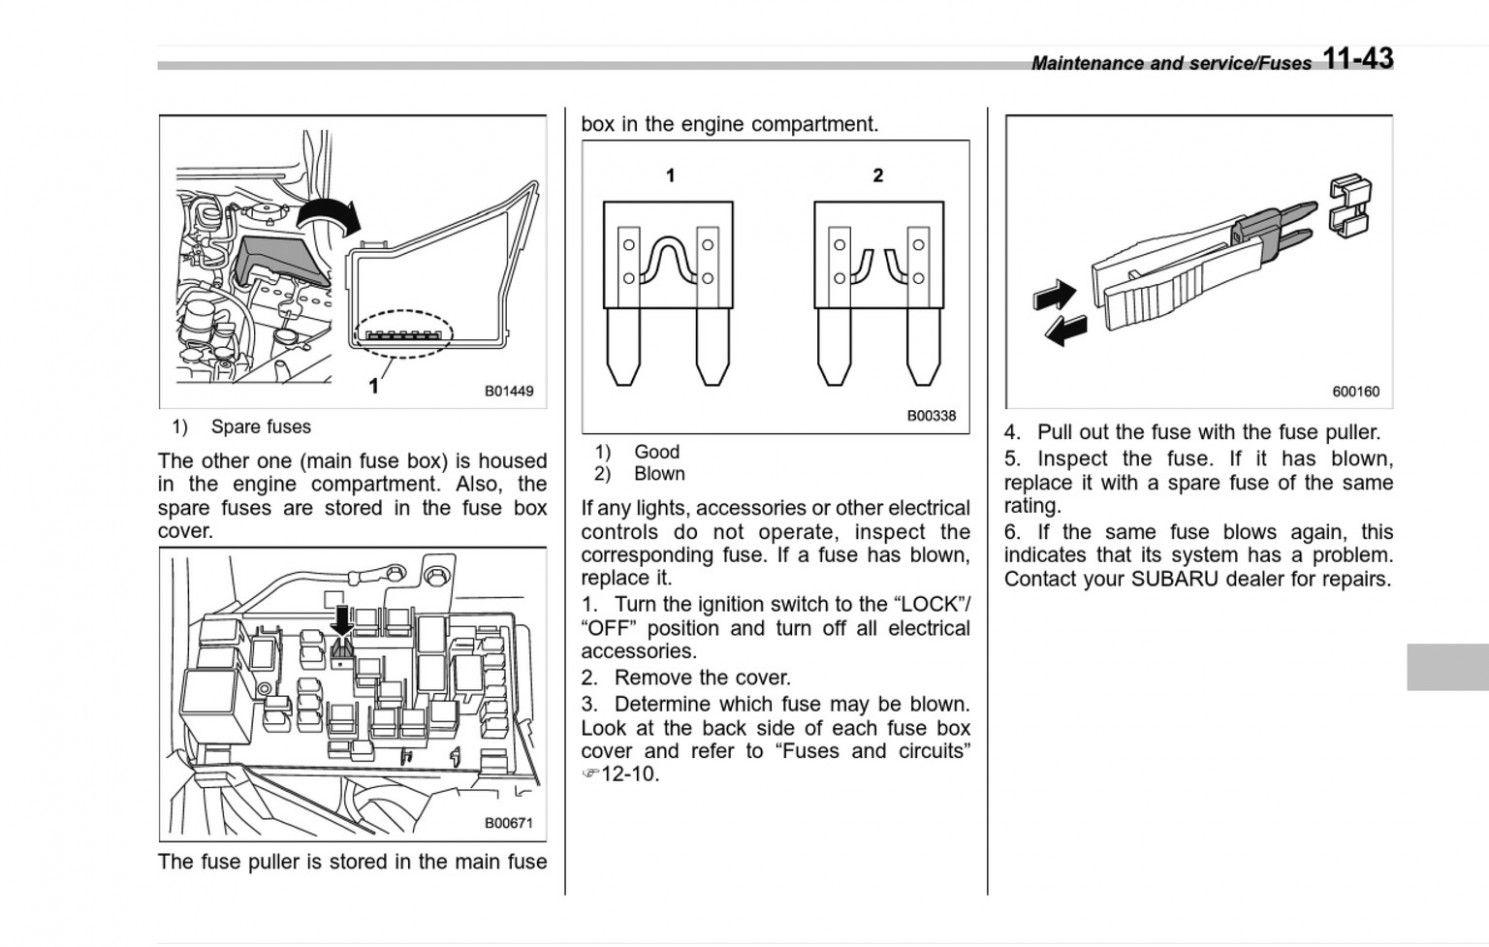 [DIAGRAM] Wrx Fuse Box Diagram